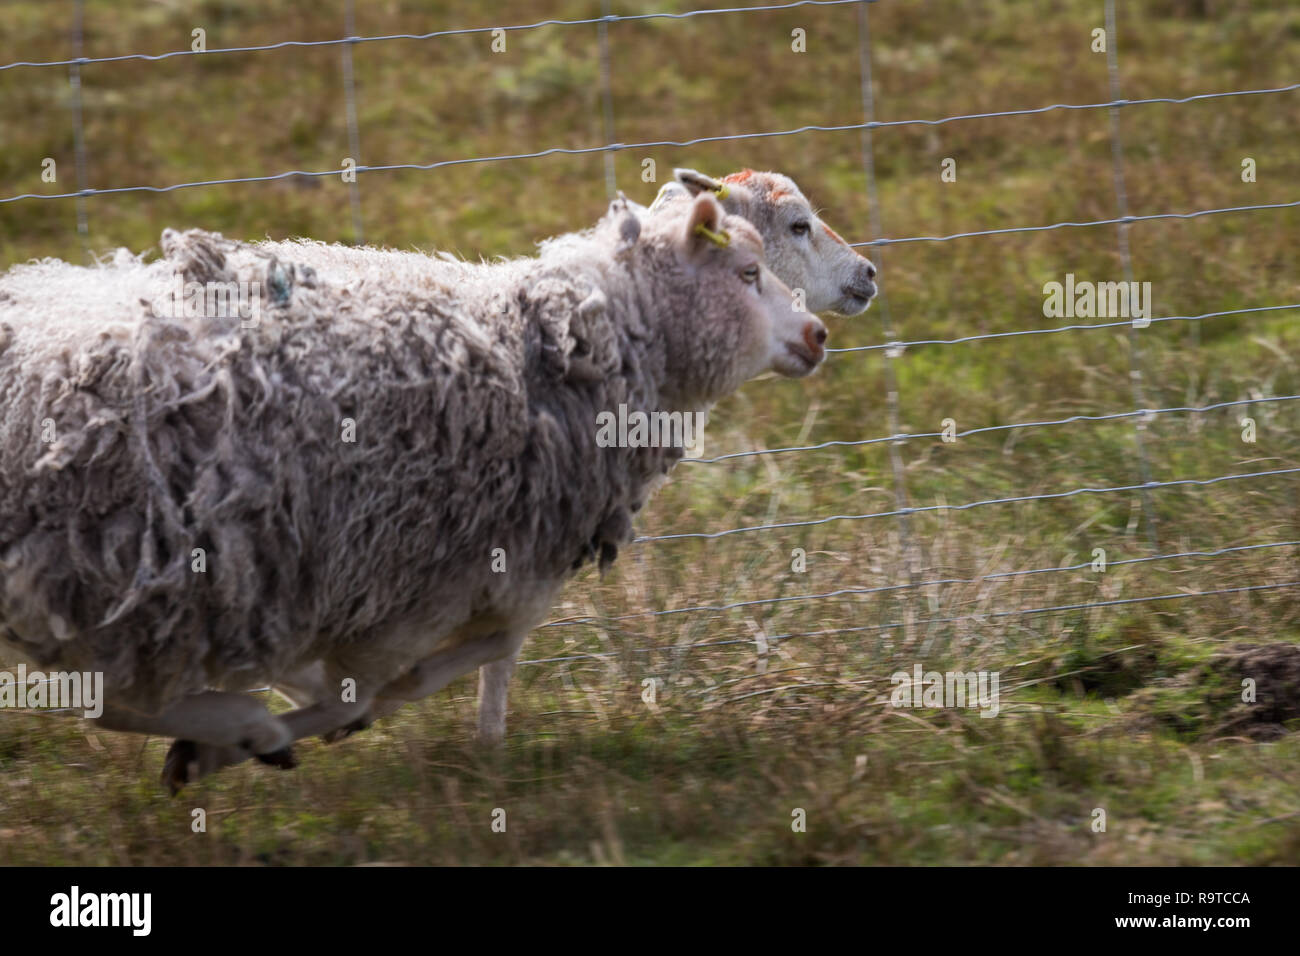 Sheep on the run - Stock Image